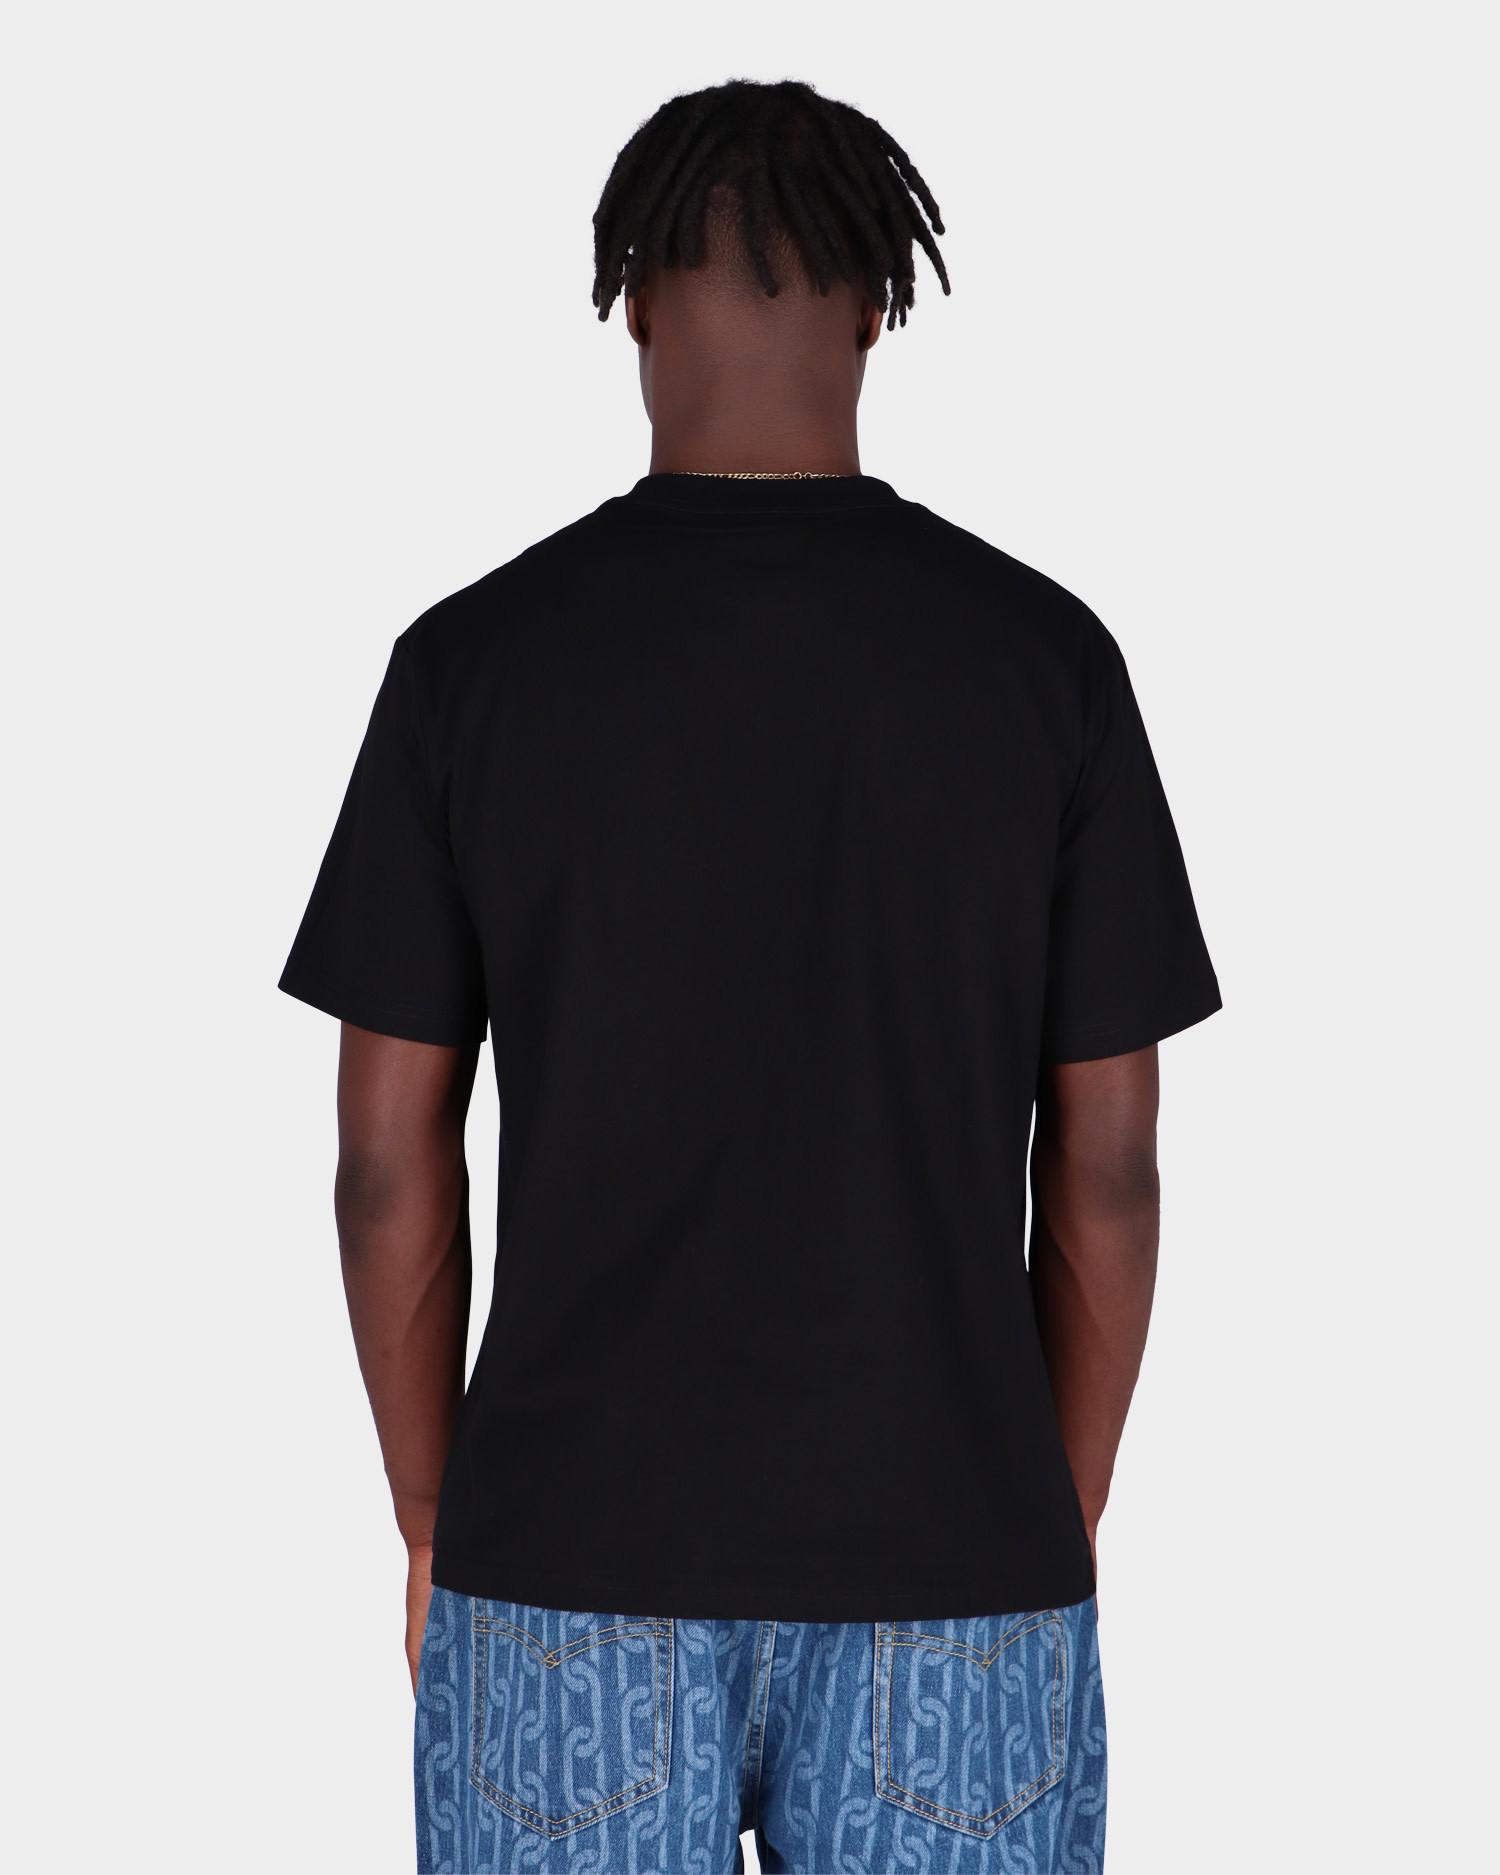 Stingwater Tough Time T-Shirt Black